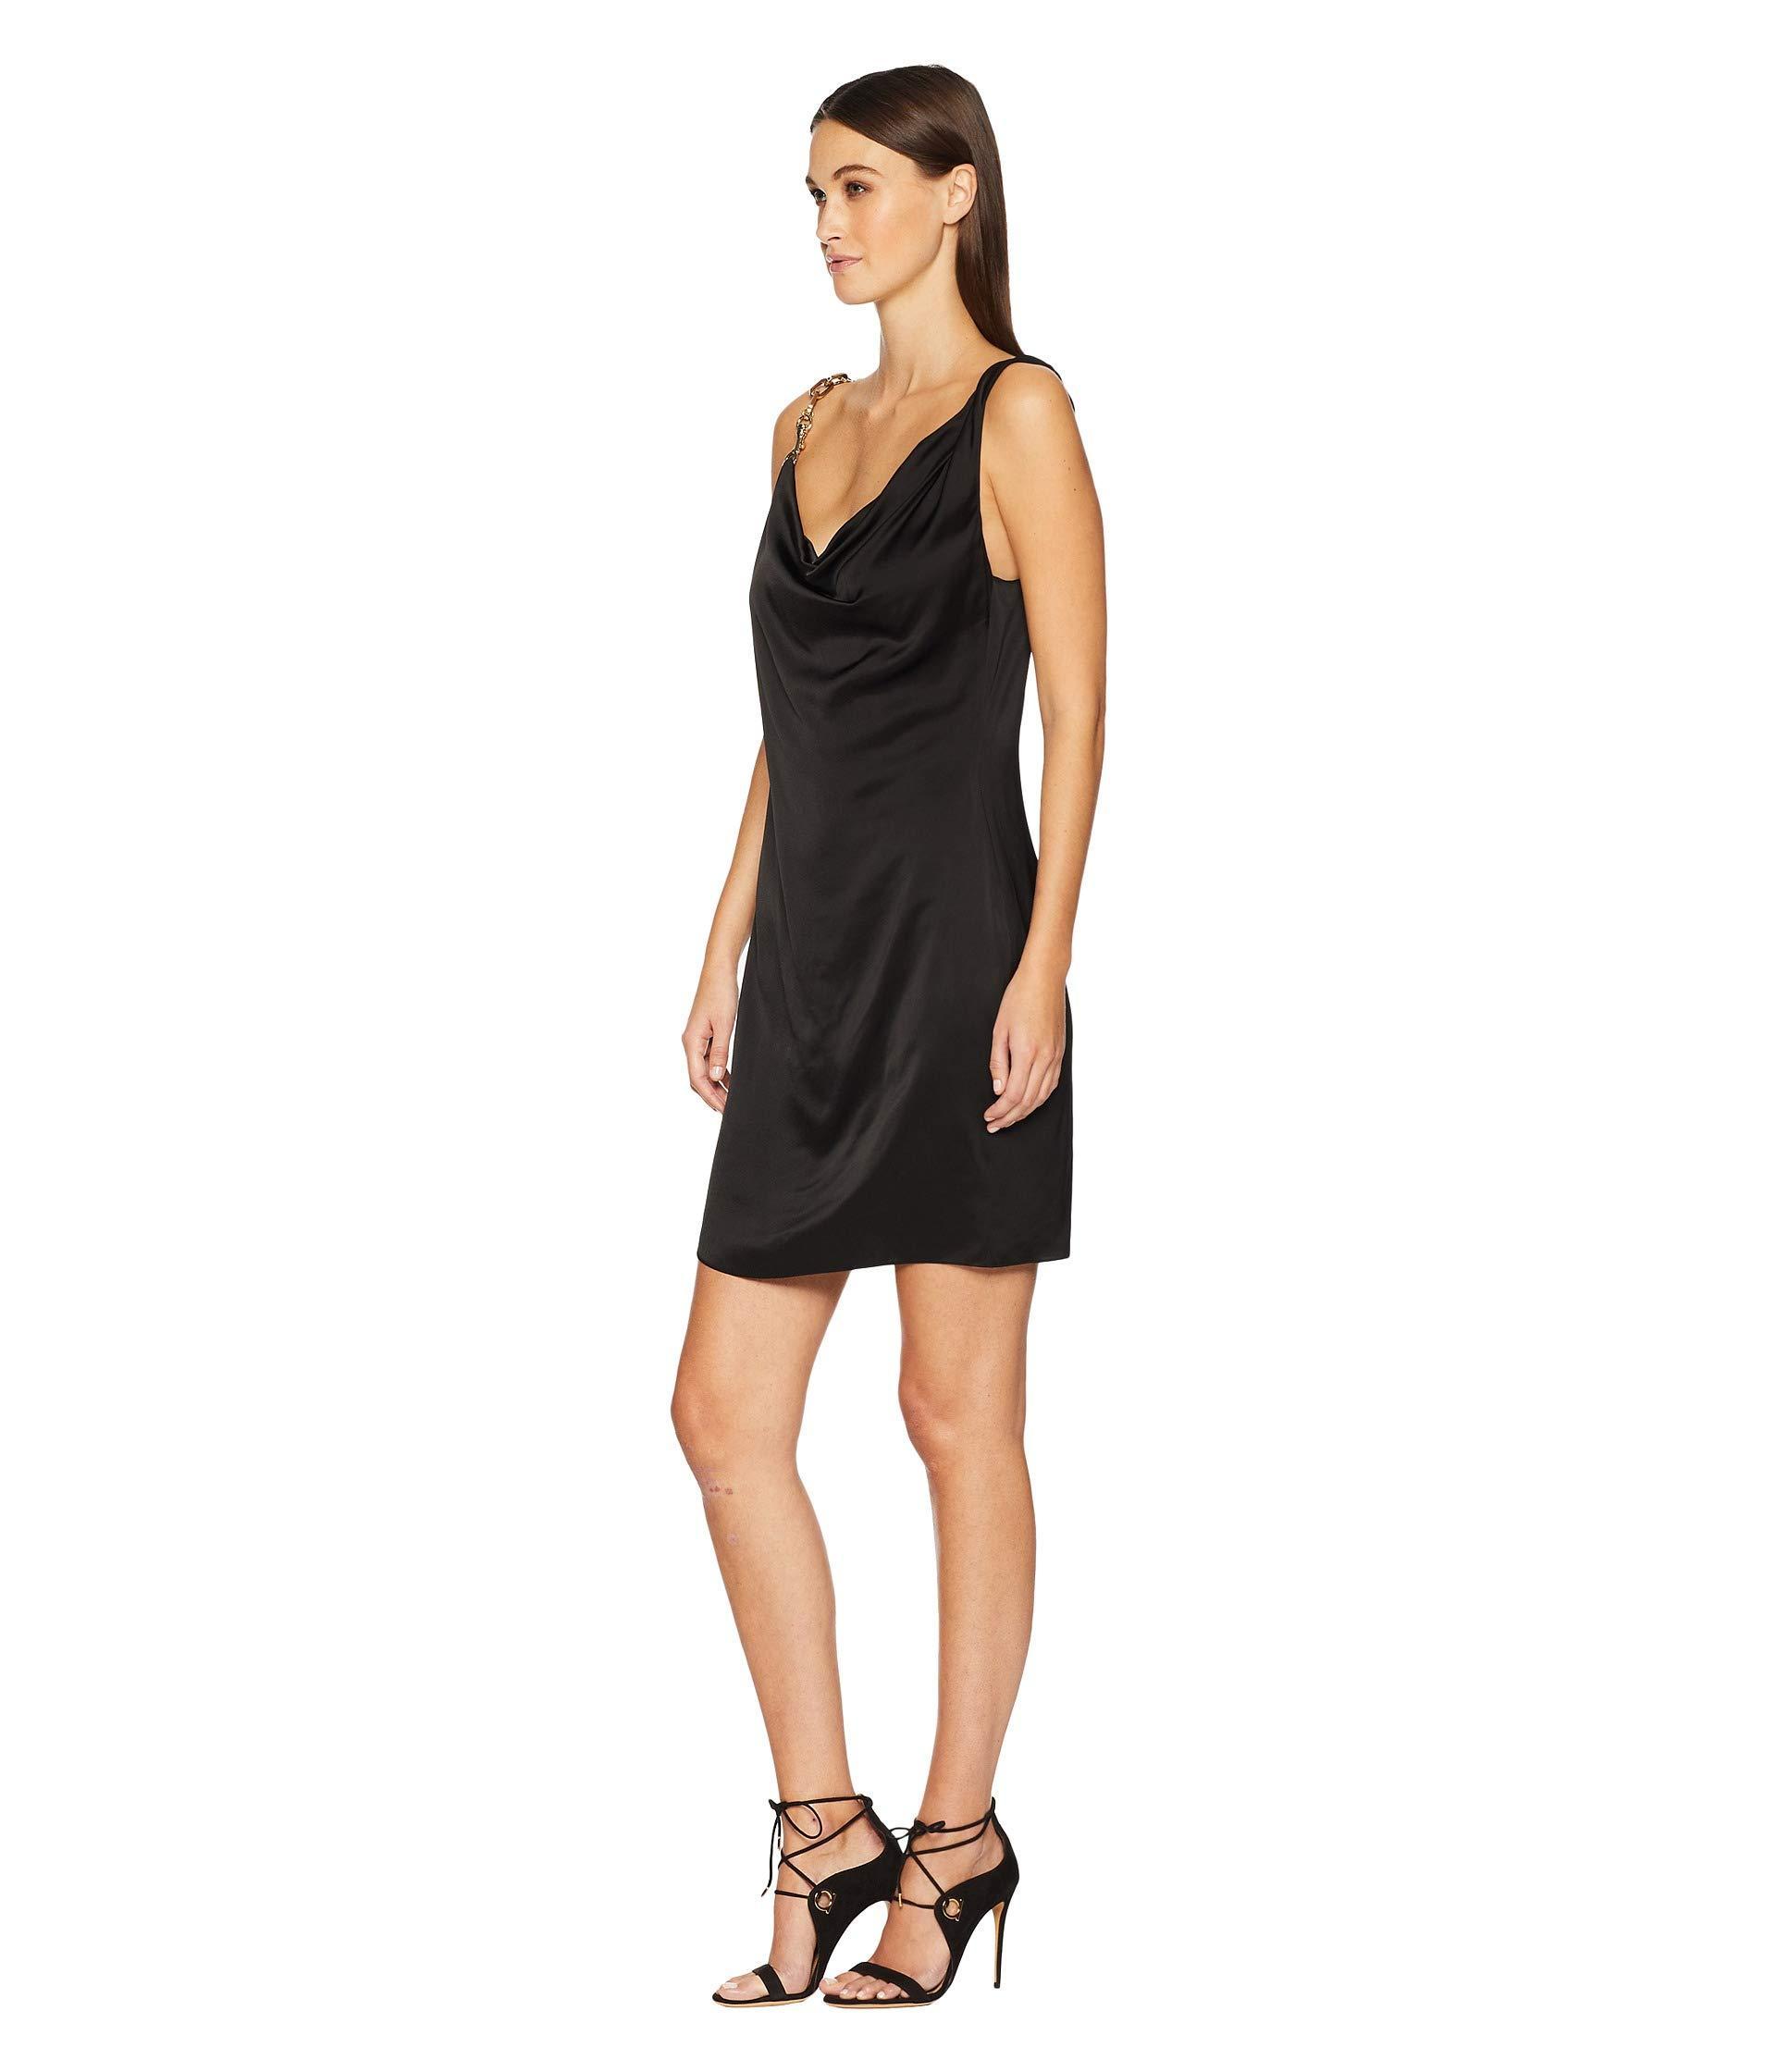 f2f9c605af80 Lyst - Versus Abito Donna Tessuto Dress in Black - Save 20%